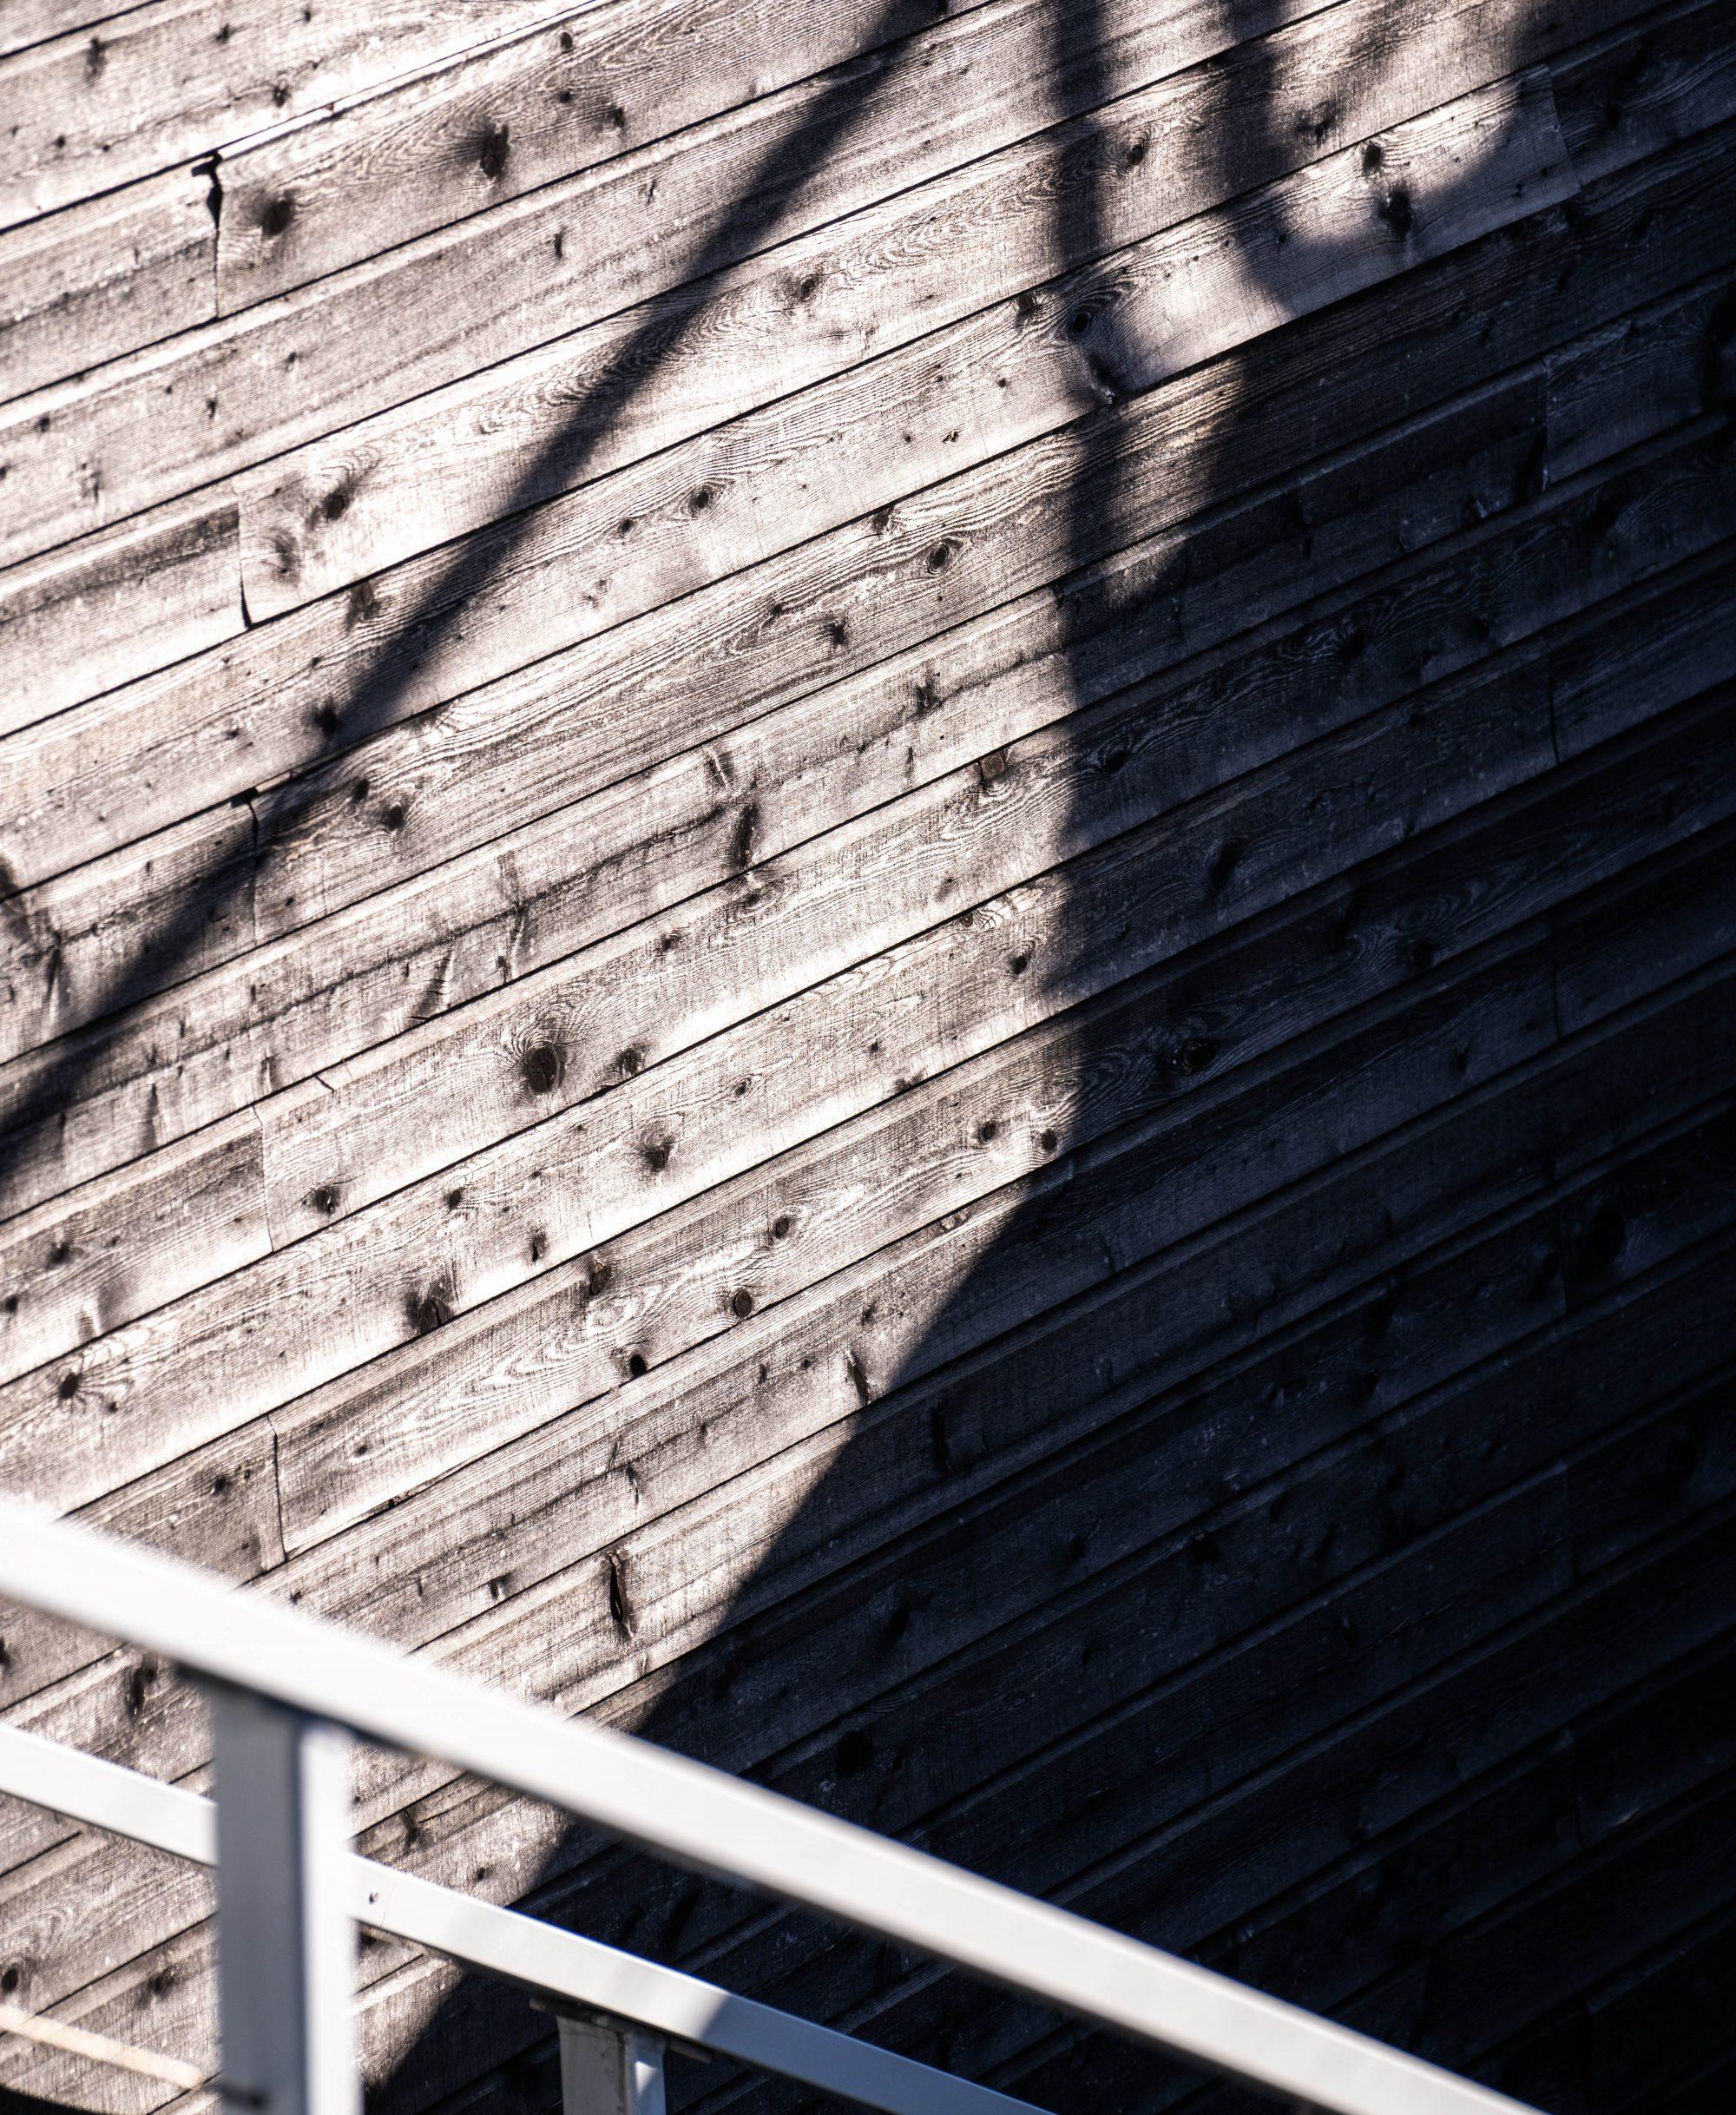 Shadow of stair railing on wood